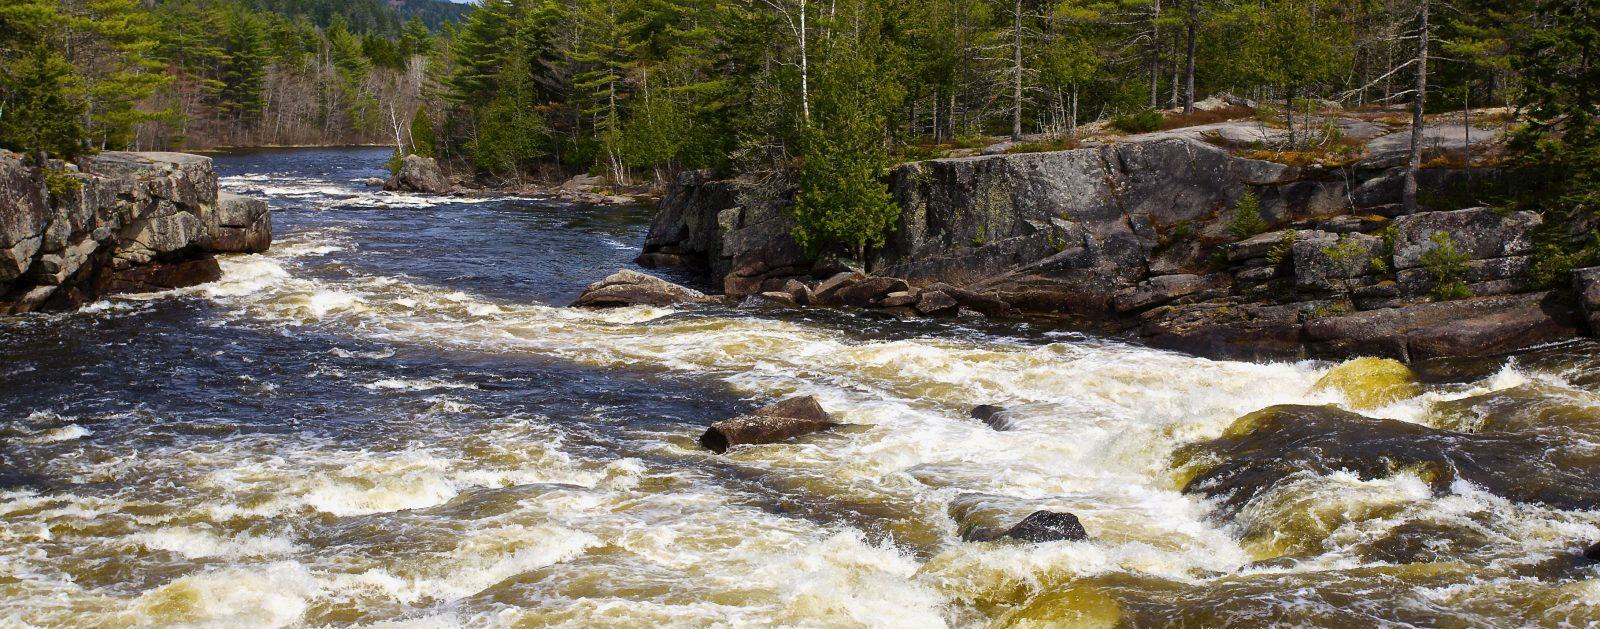 Penobscot River, ME | Photo by Tim Palmer